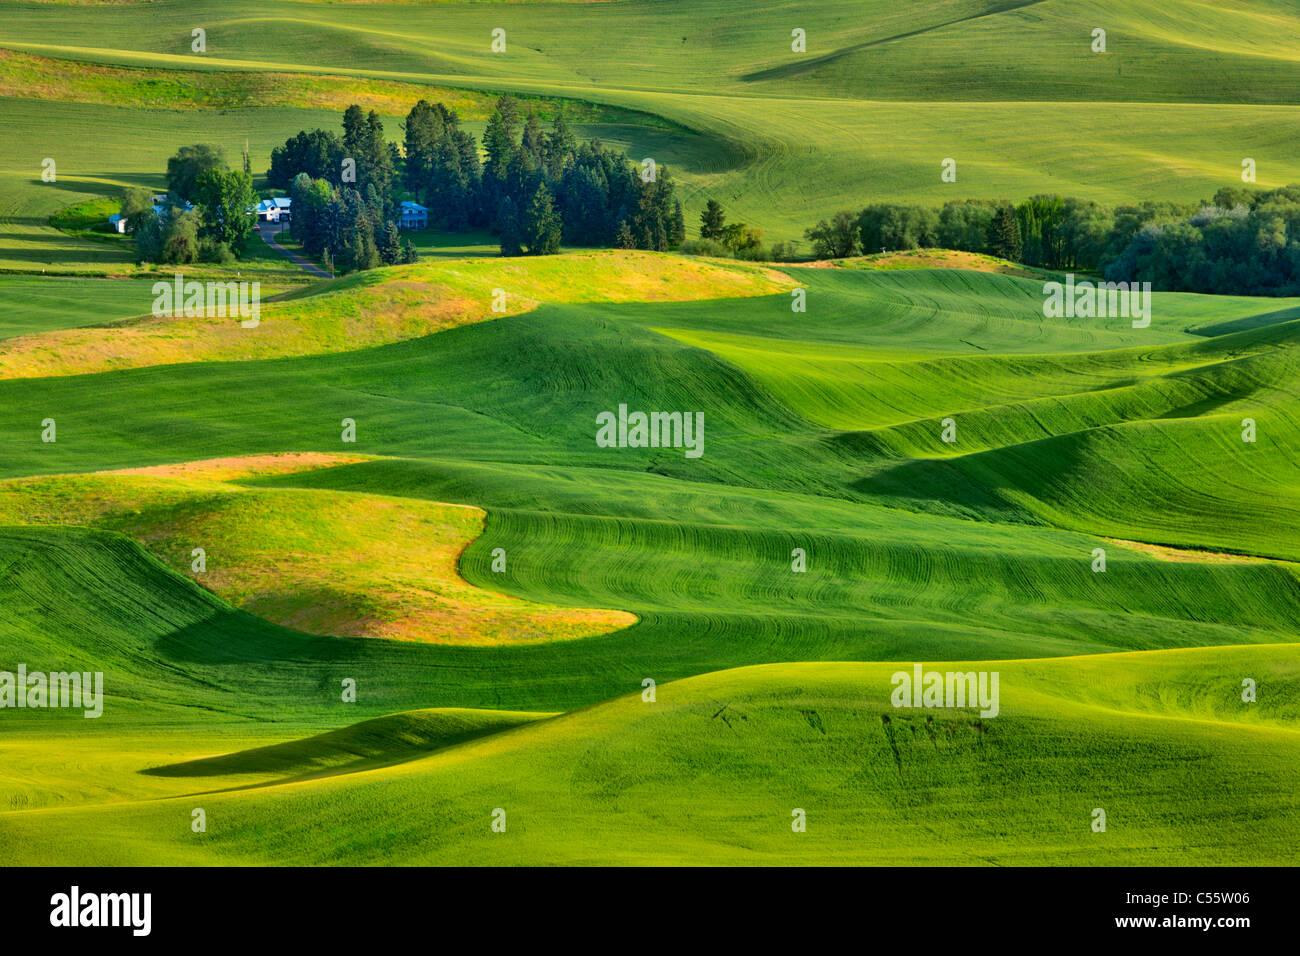 High angle view of green fields, Steptoe Butte, Palouse, Washington State, USA Stock Foto